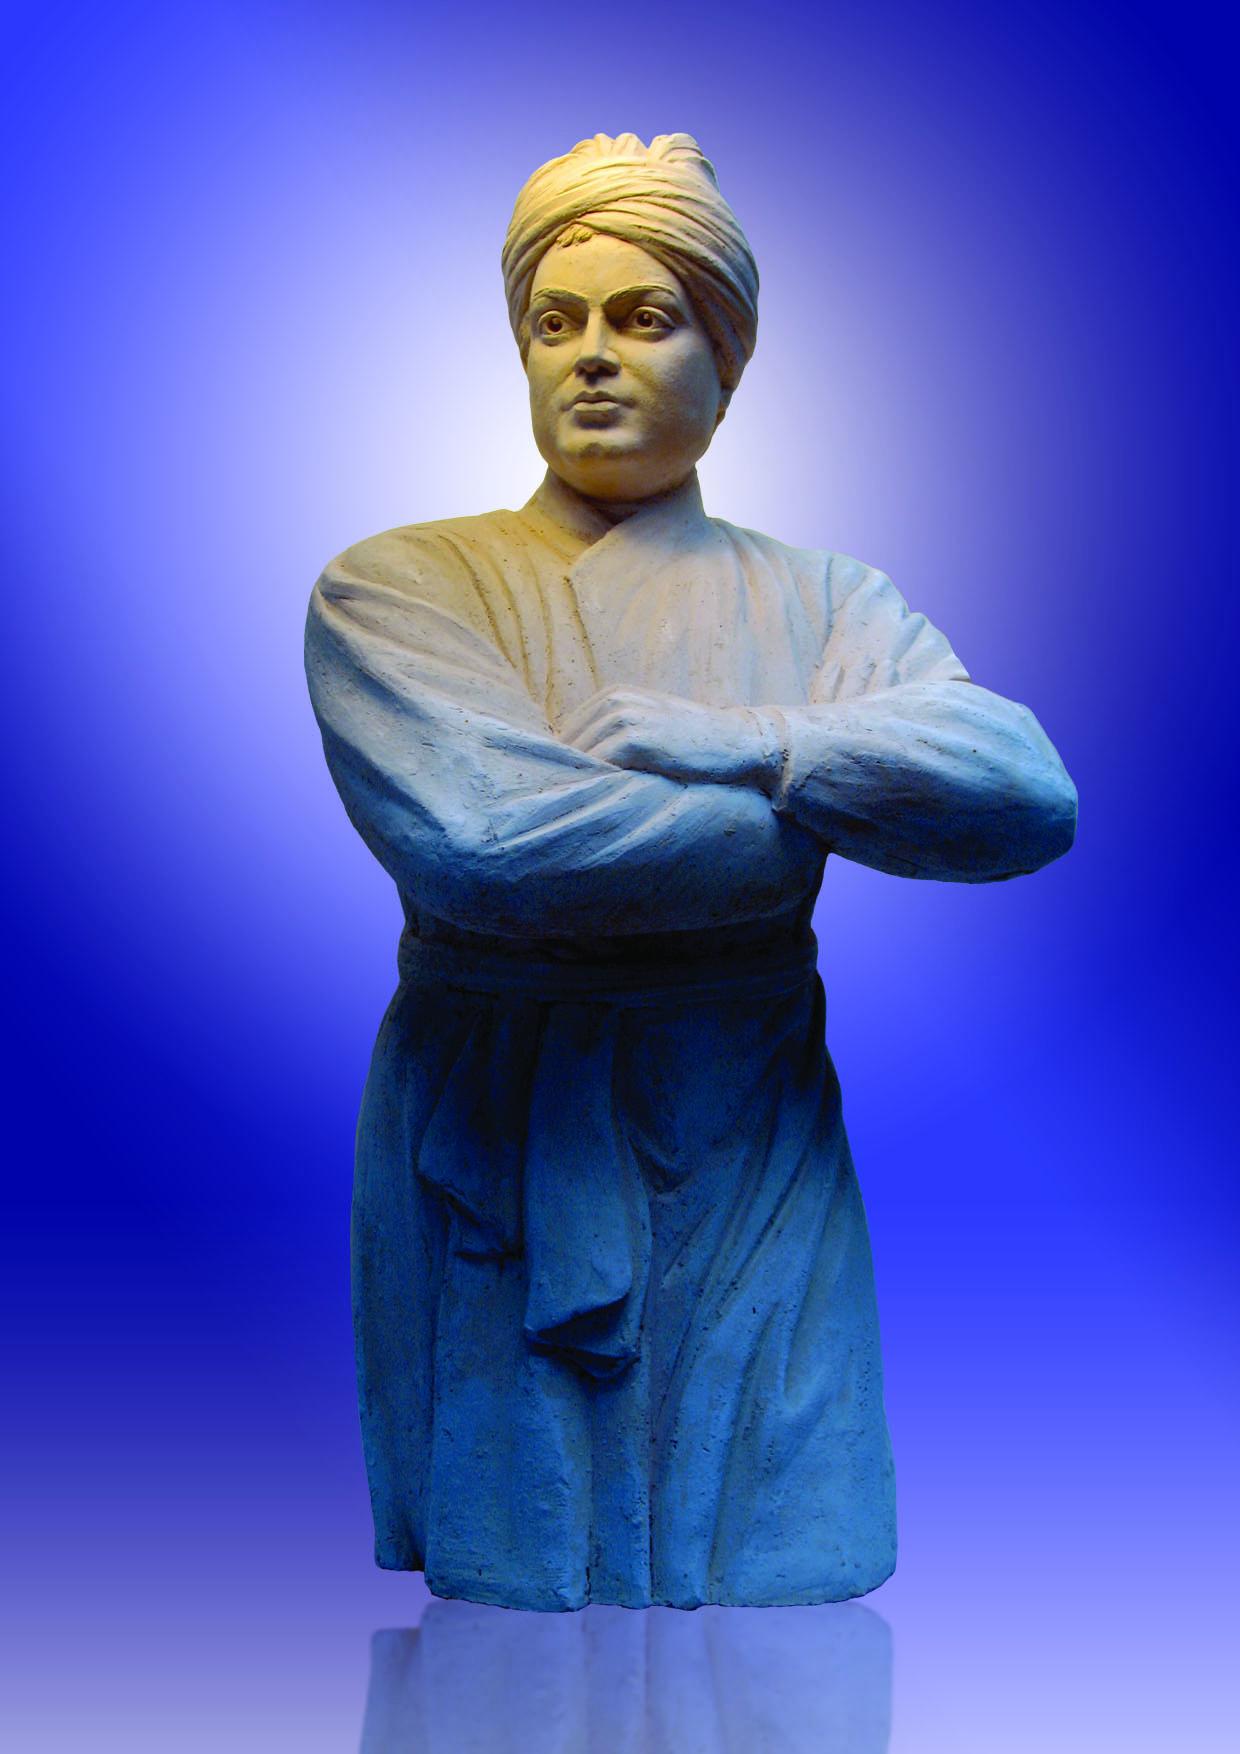 Свамі Вівекананда. 2004 - svami vivekananda